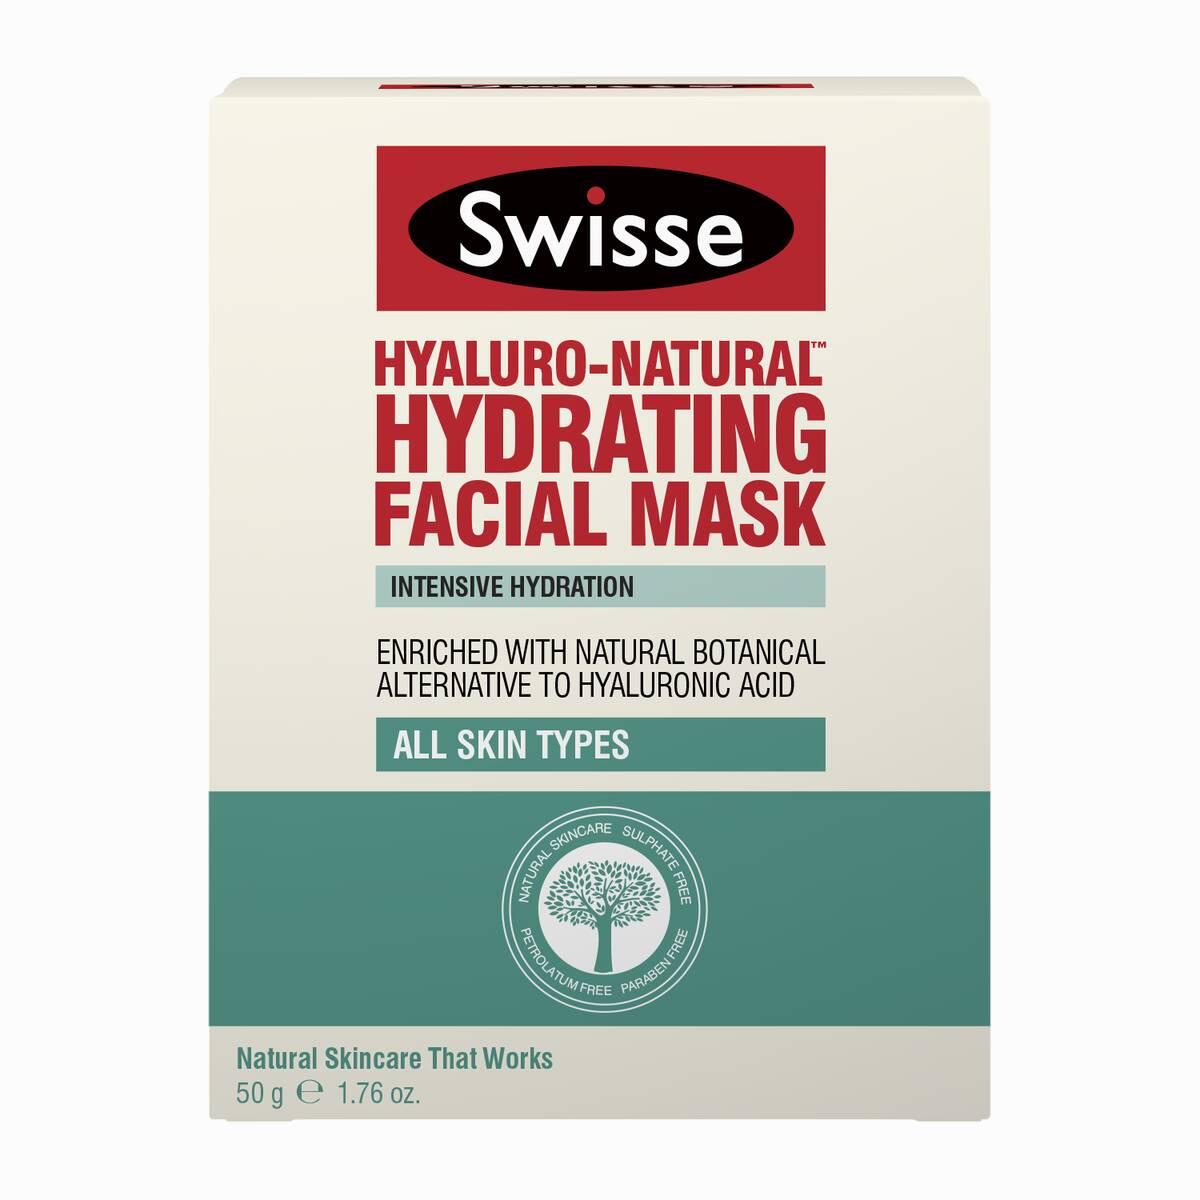 Swisse Hyaluro-Natural Hydrating facial mask carton